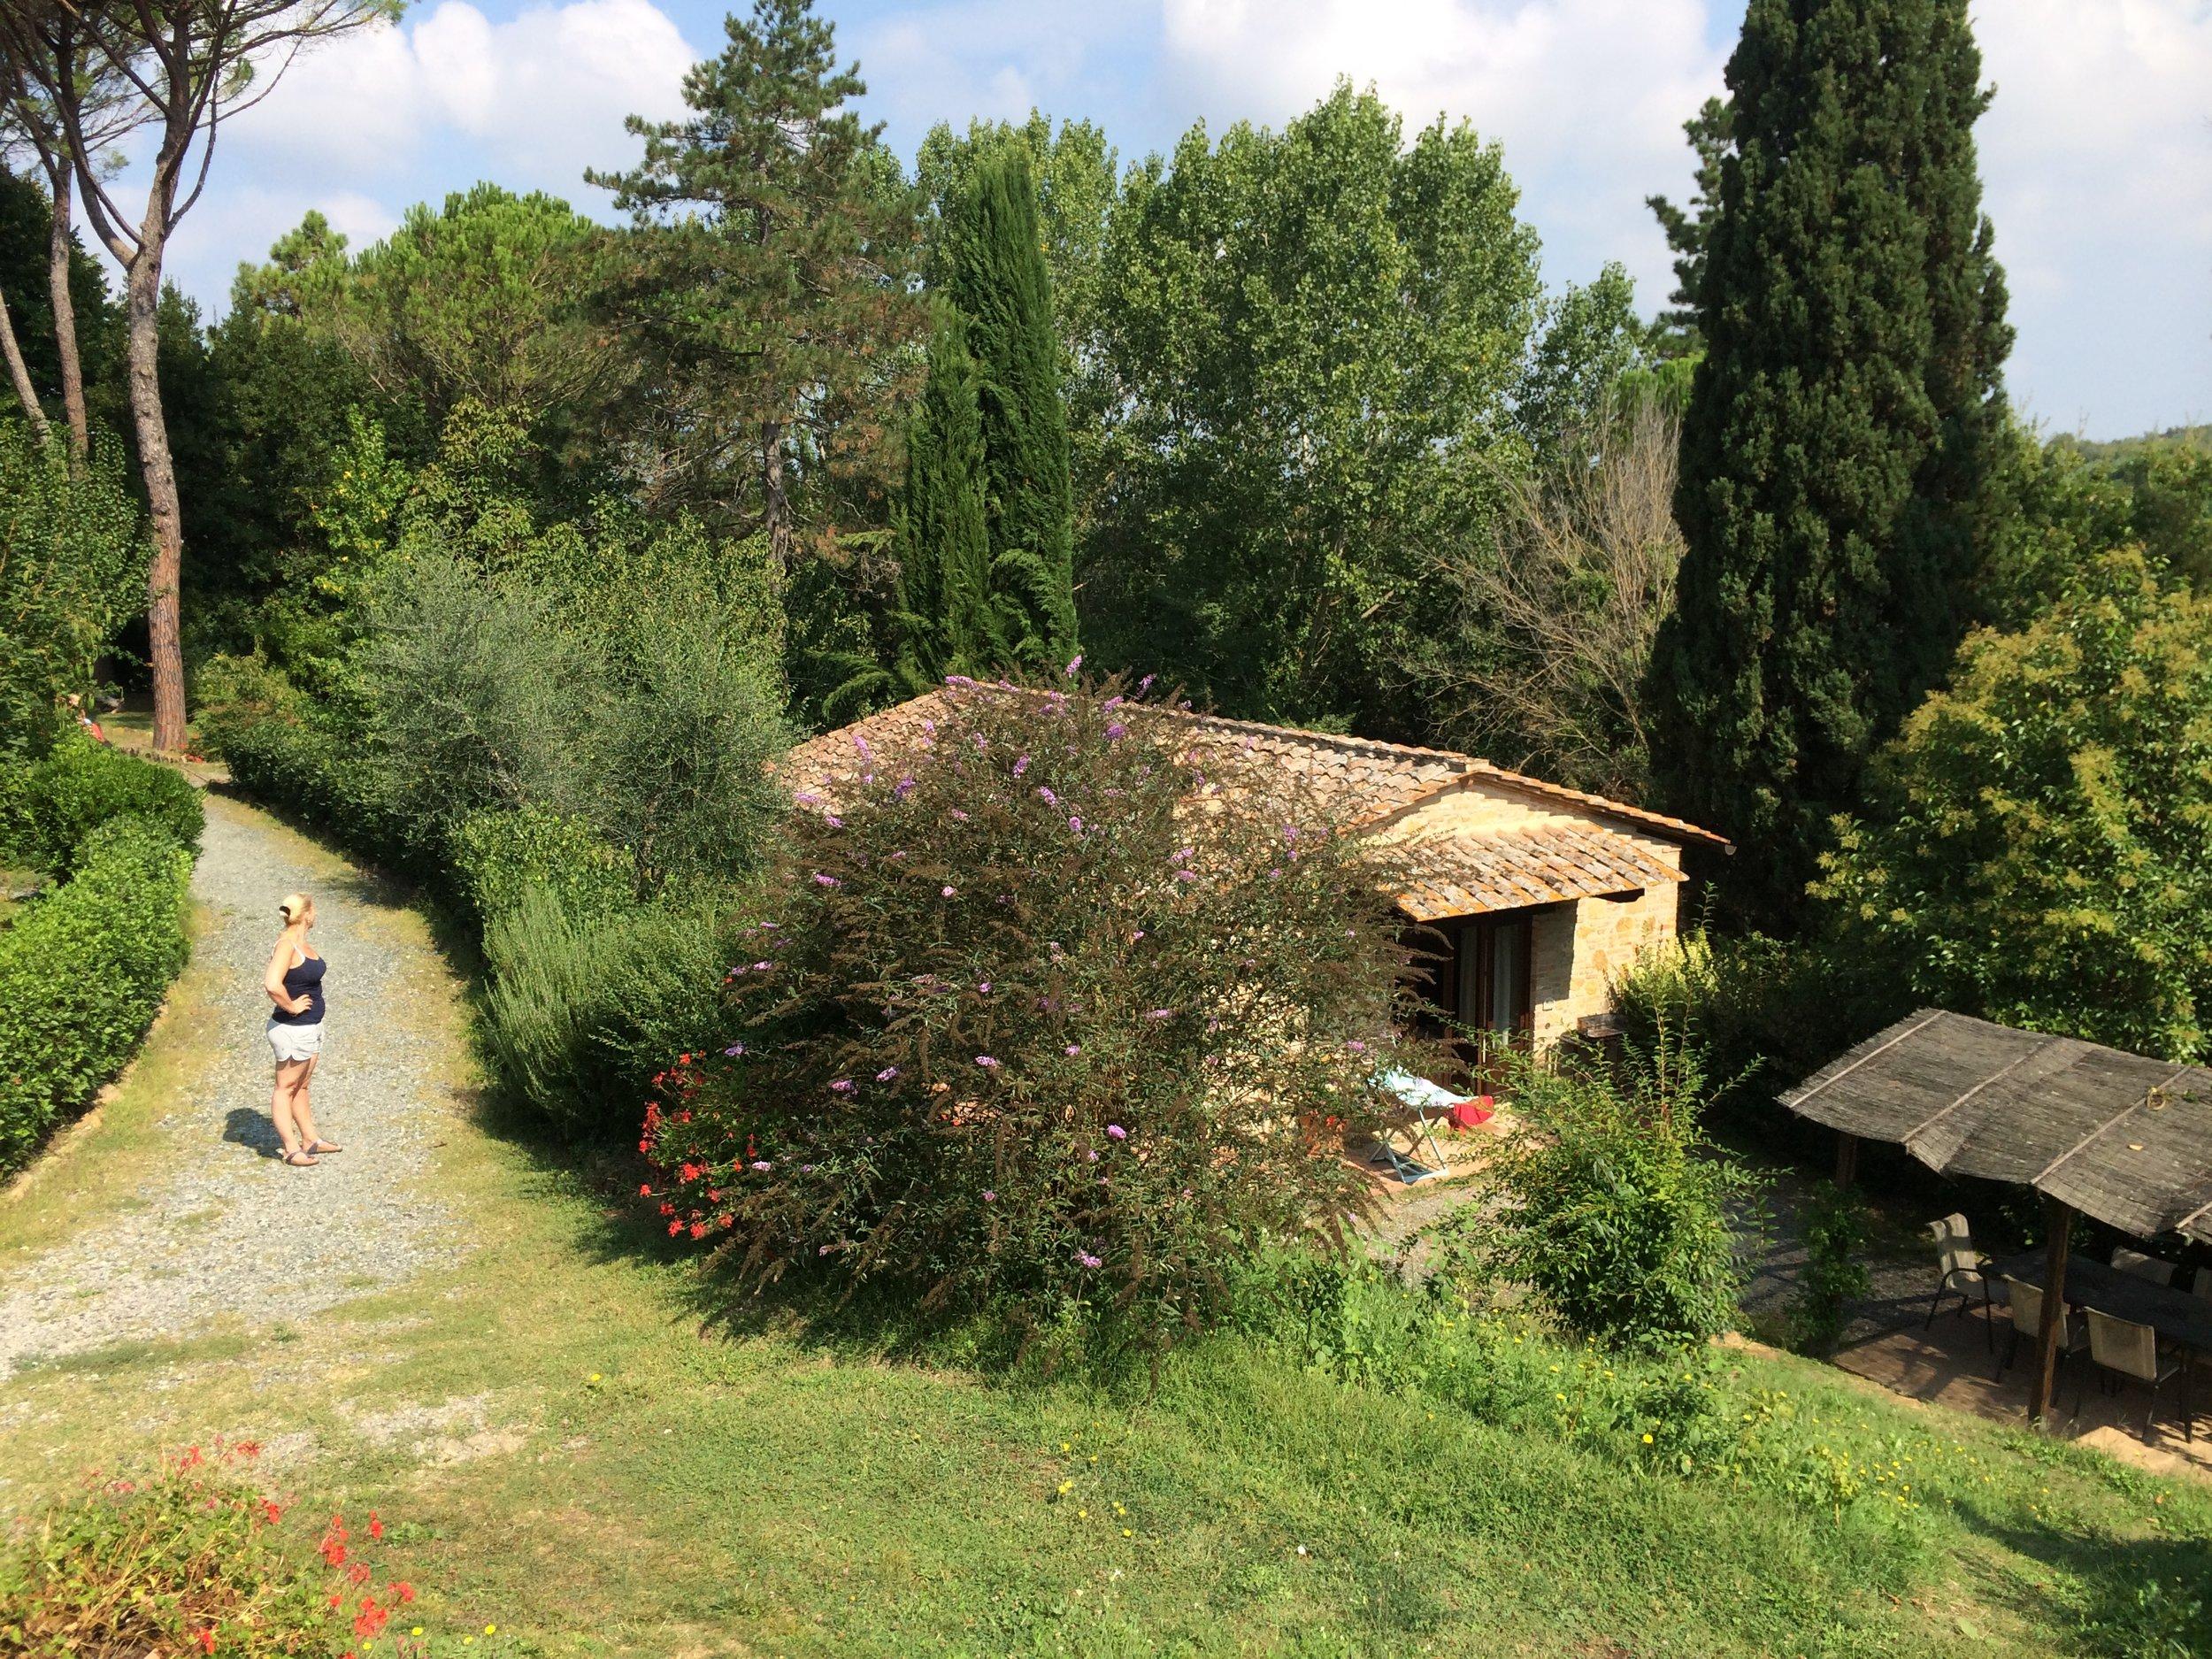 Borgo-1092.JPG